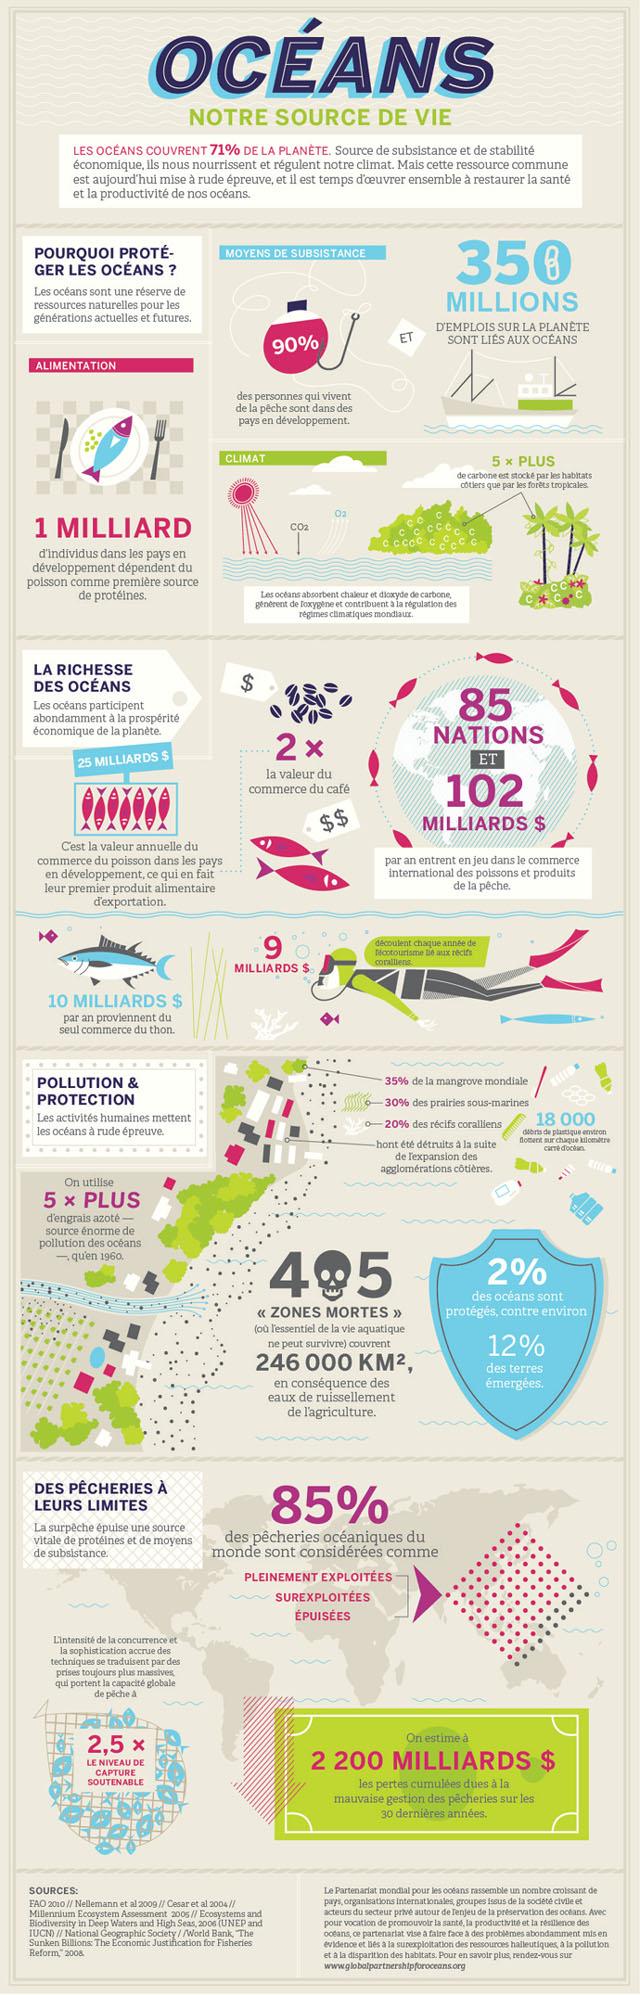 ocean ressources